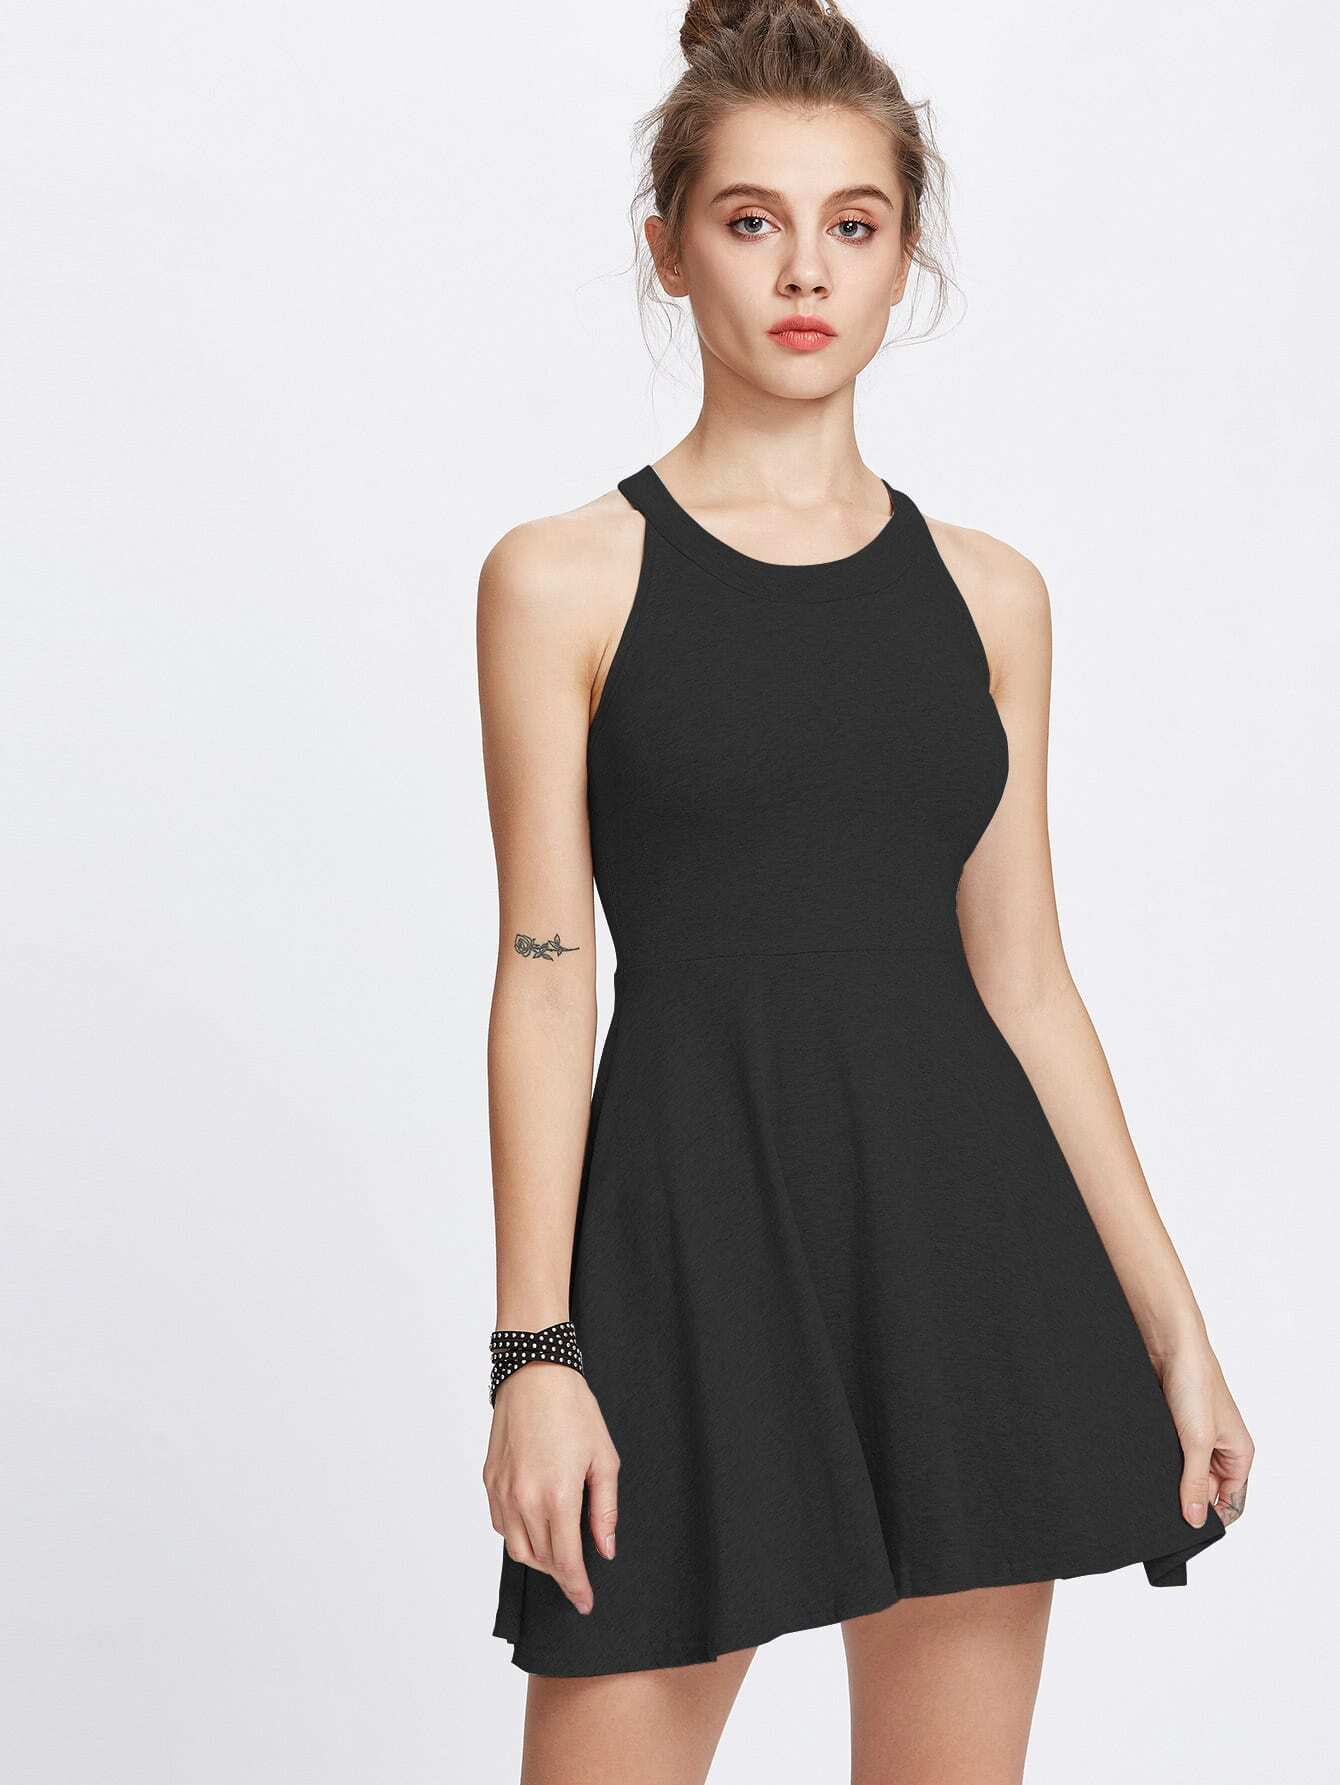 Halter Neckline A Line Dress